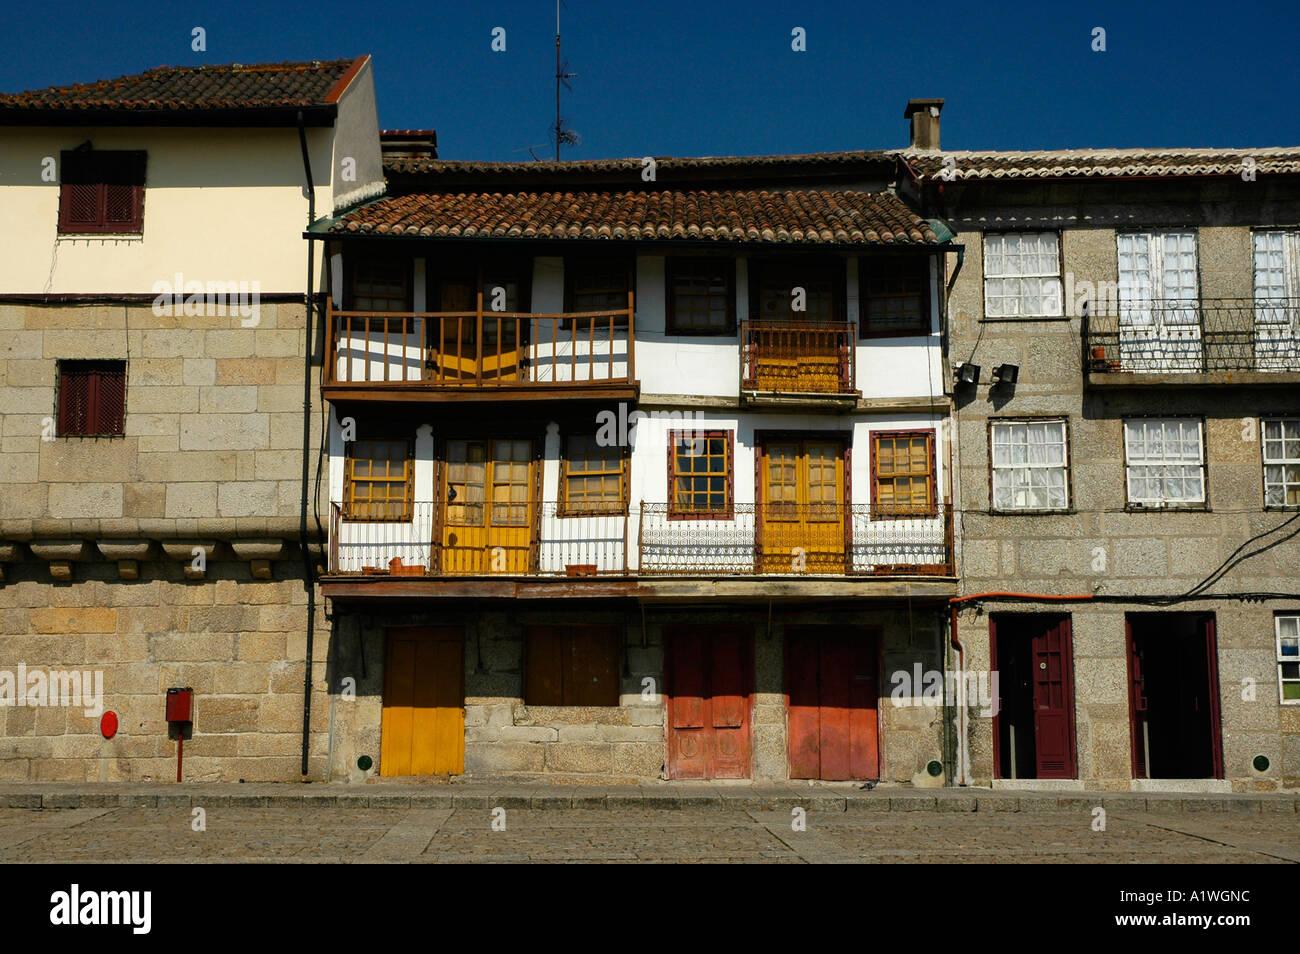 portugal minho region guimaraes town stockfotos portugal minho region guimaraes town bilder. Black Bedroom Furniture Sets. Home Design Ideas